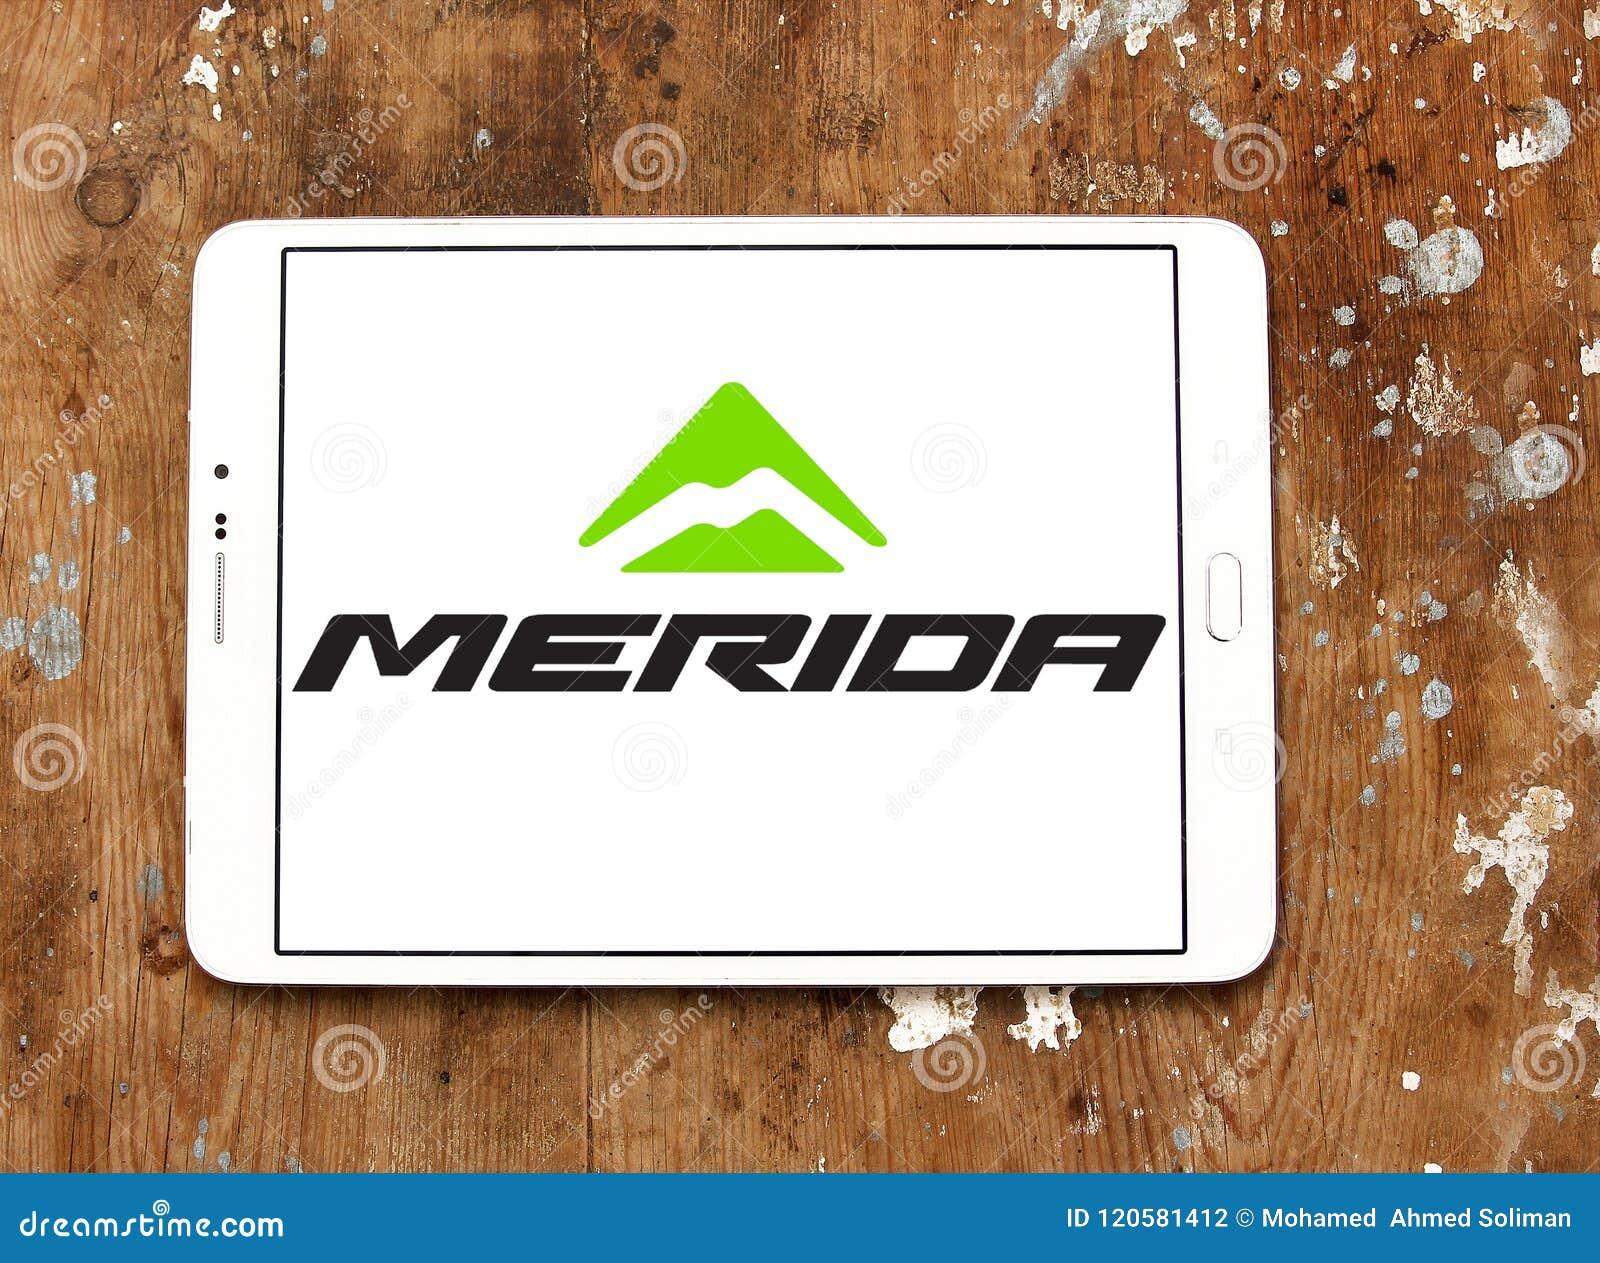 Merida Bikes company logo editorial photography  Image of bicycles